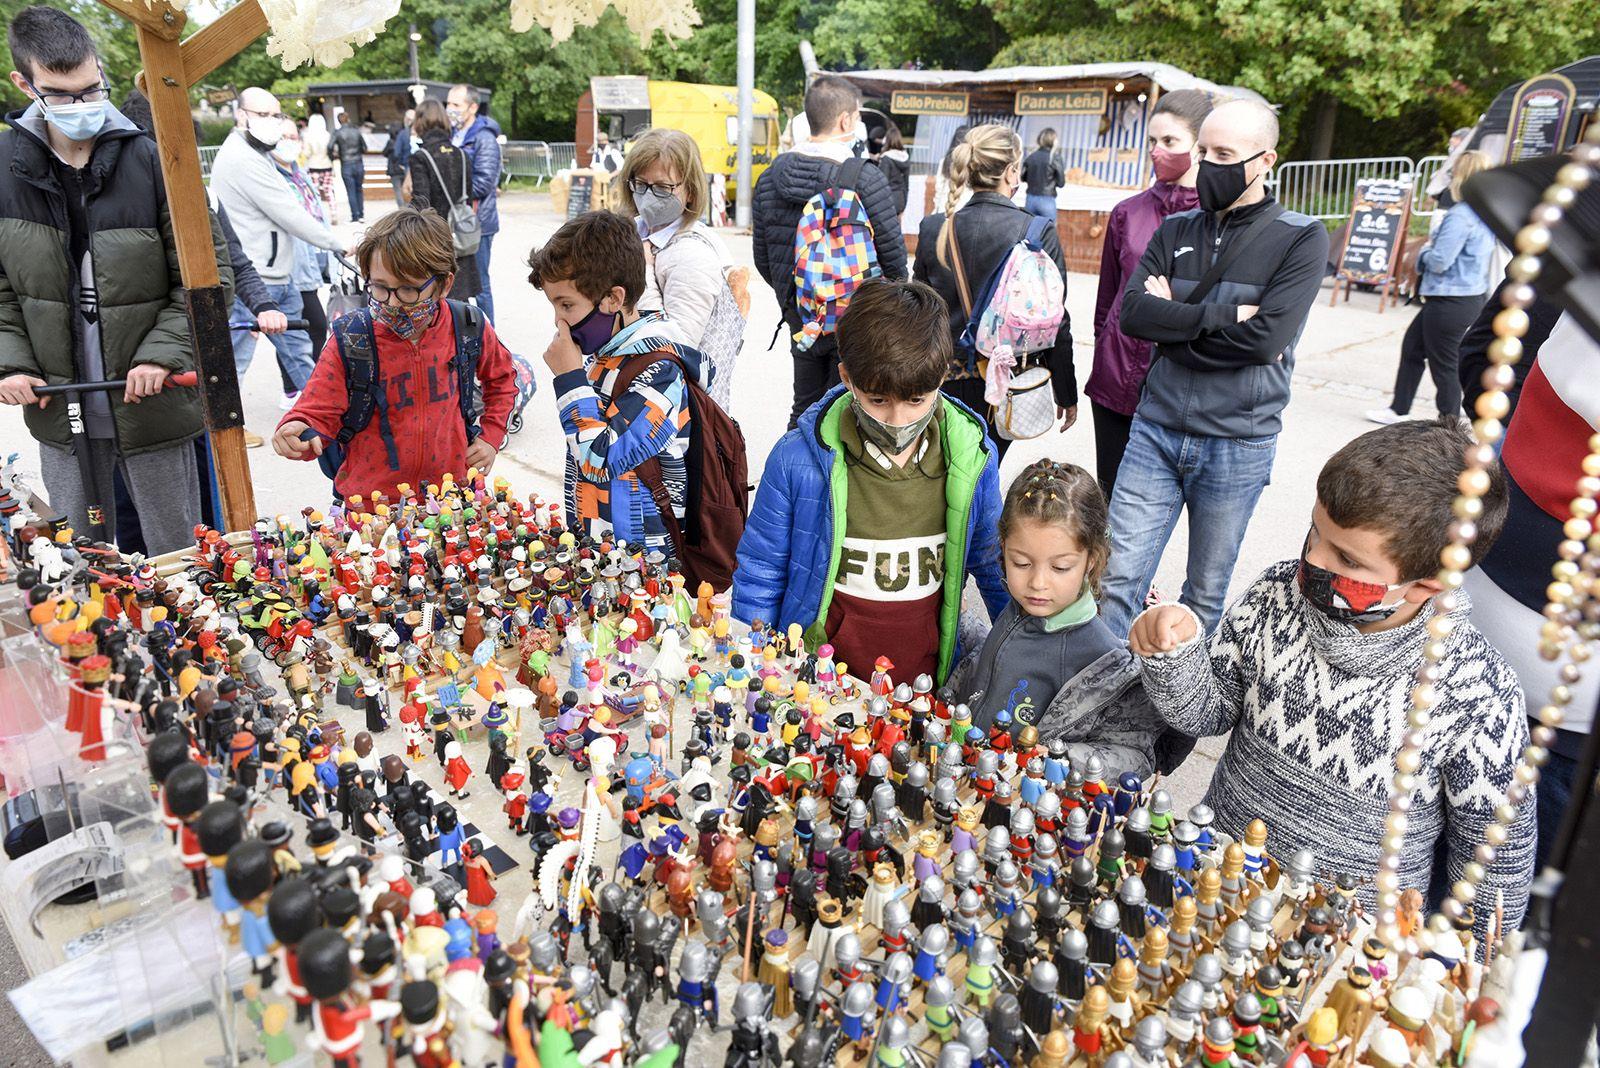 Mercat Medieval de Festa Major. Fotos: Bernat Millet.